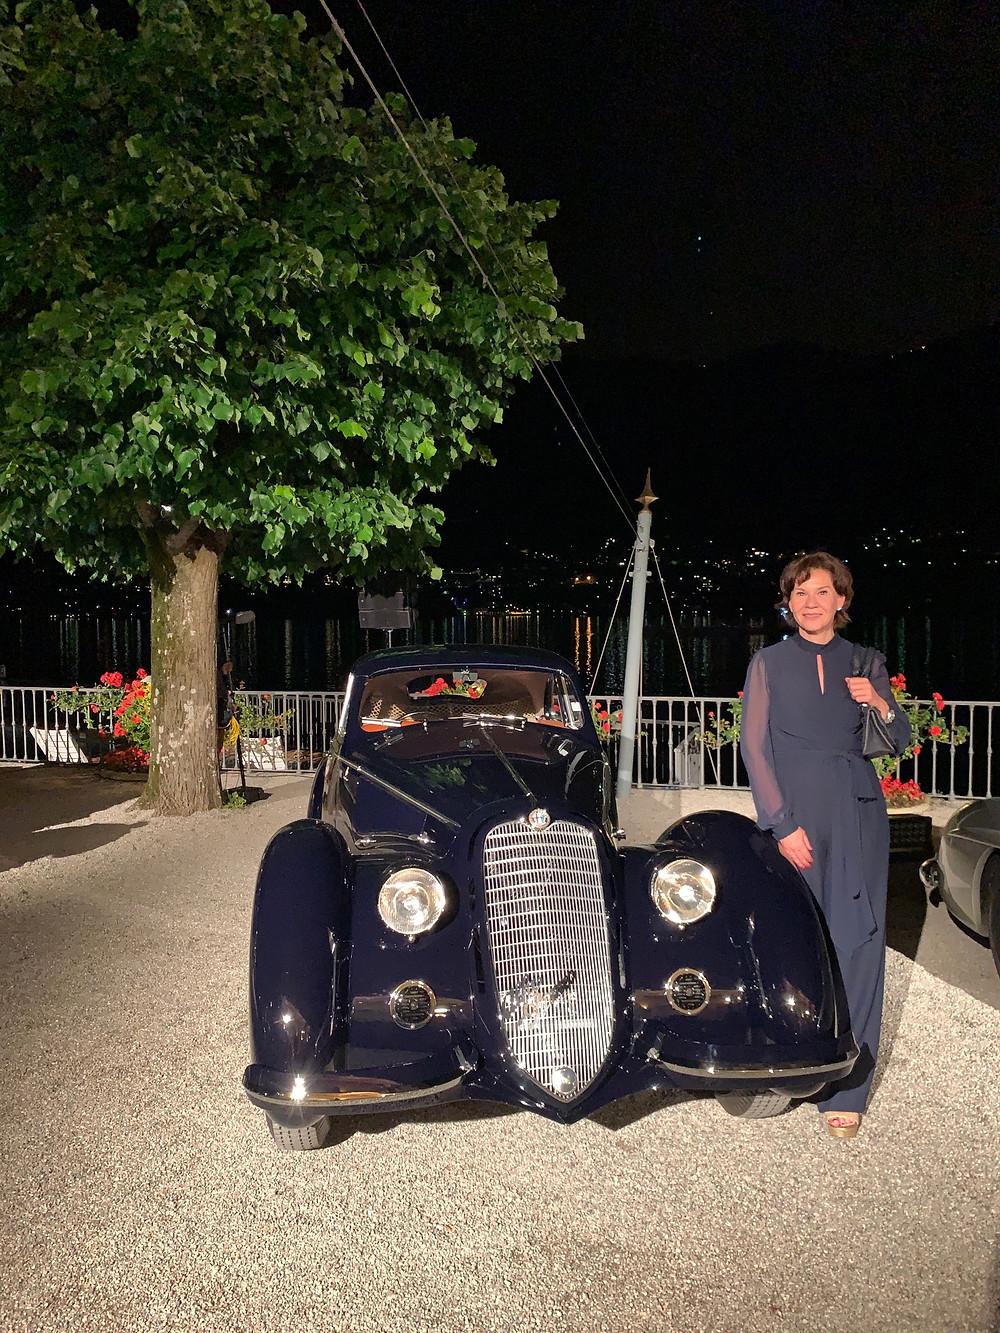 Alfa Romeo 8C 2900 B , 1937 that won best in Show in Pebble Beach 2018. well done!